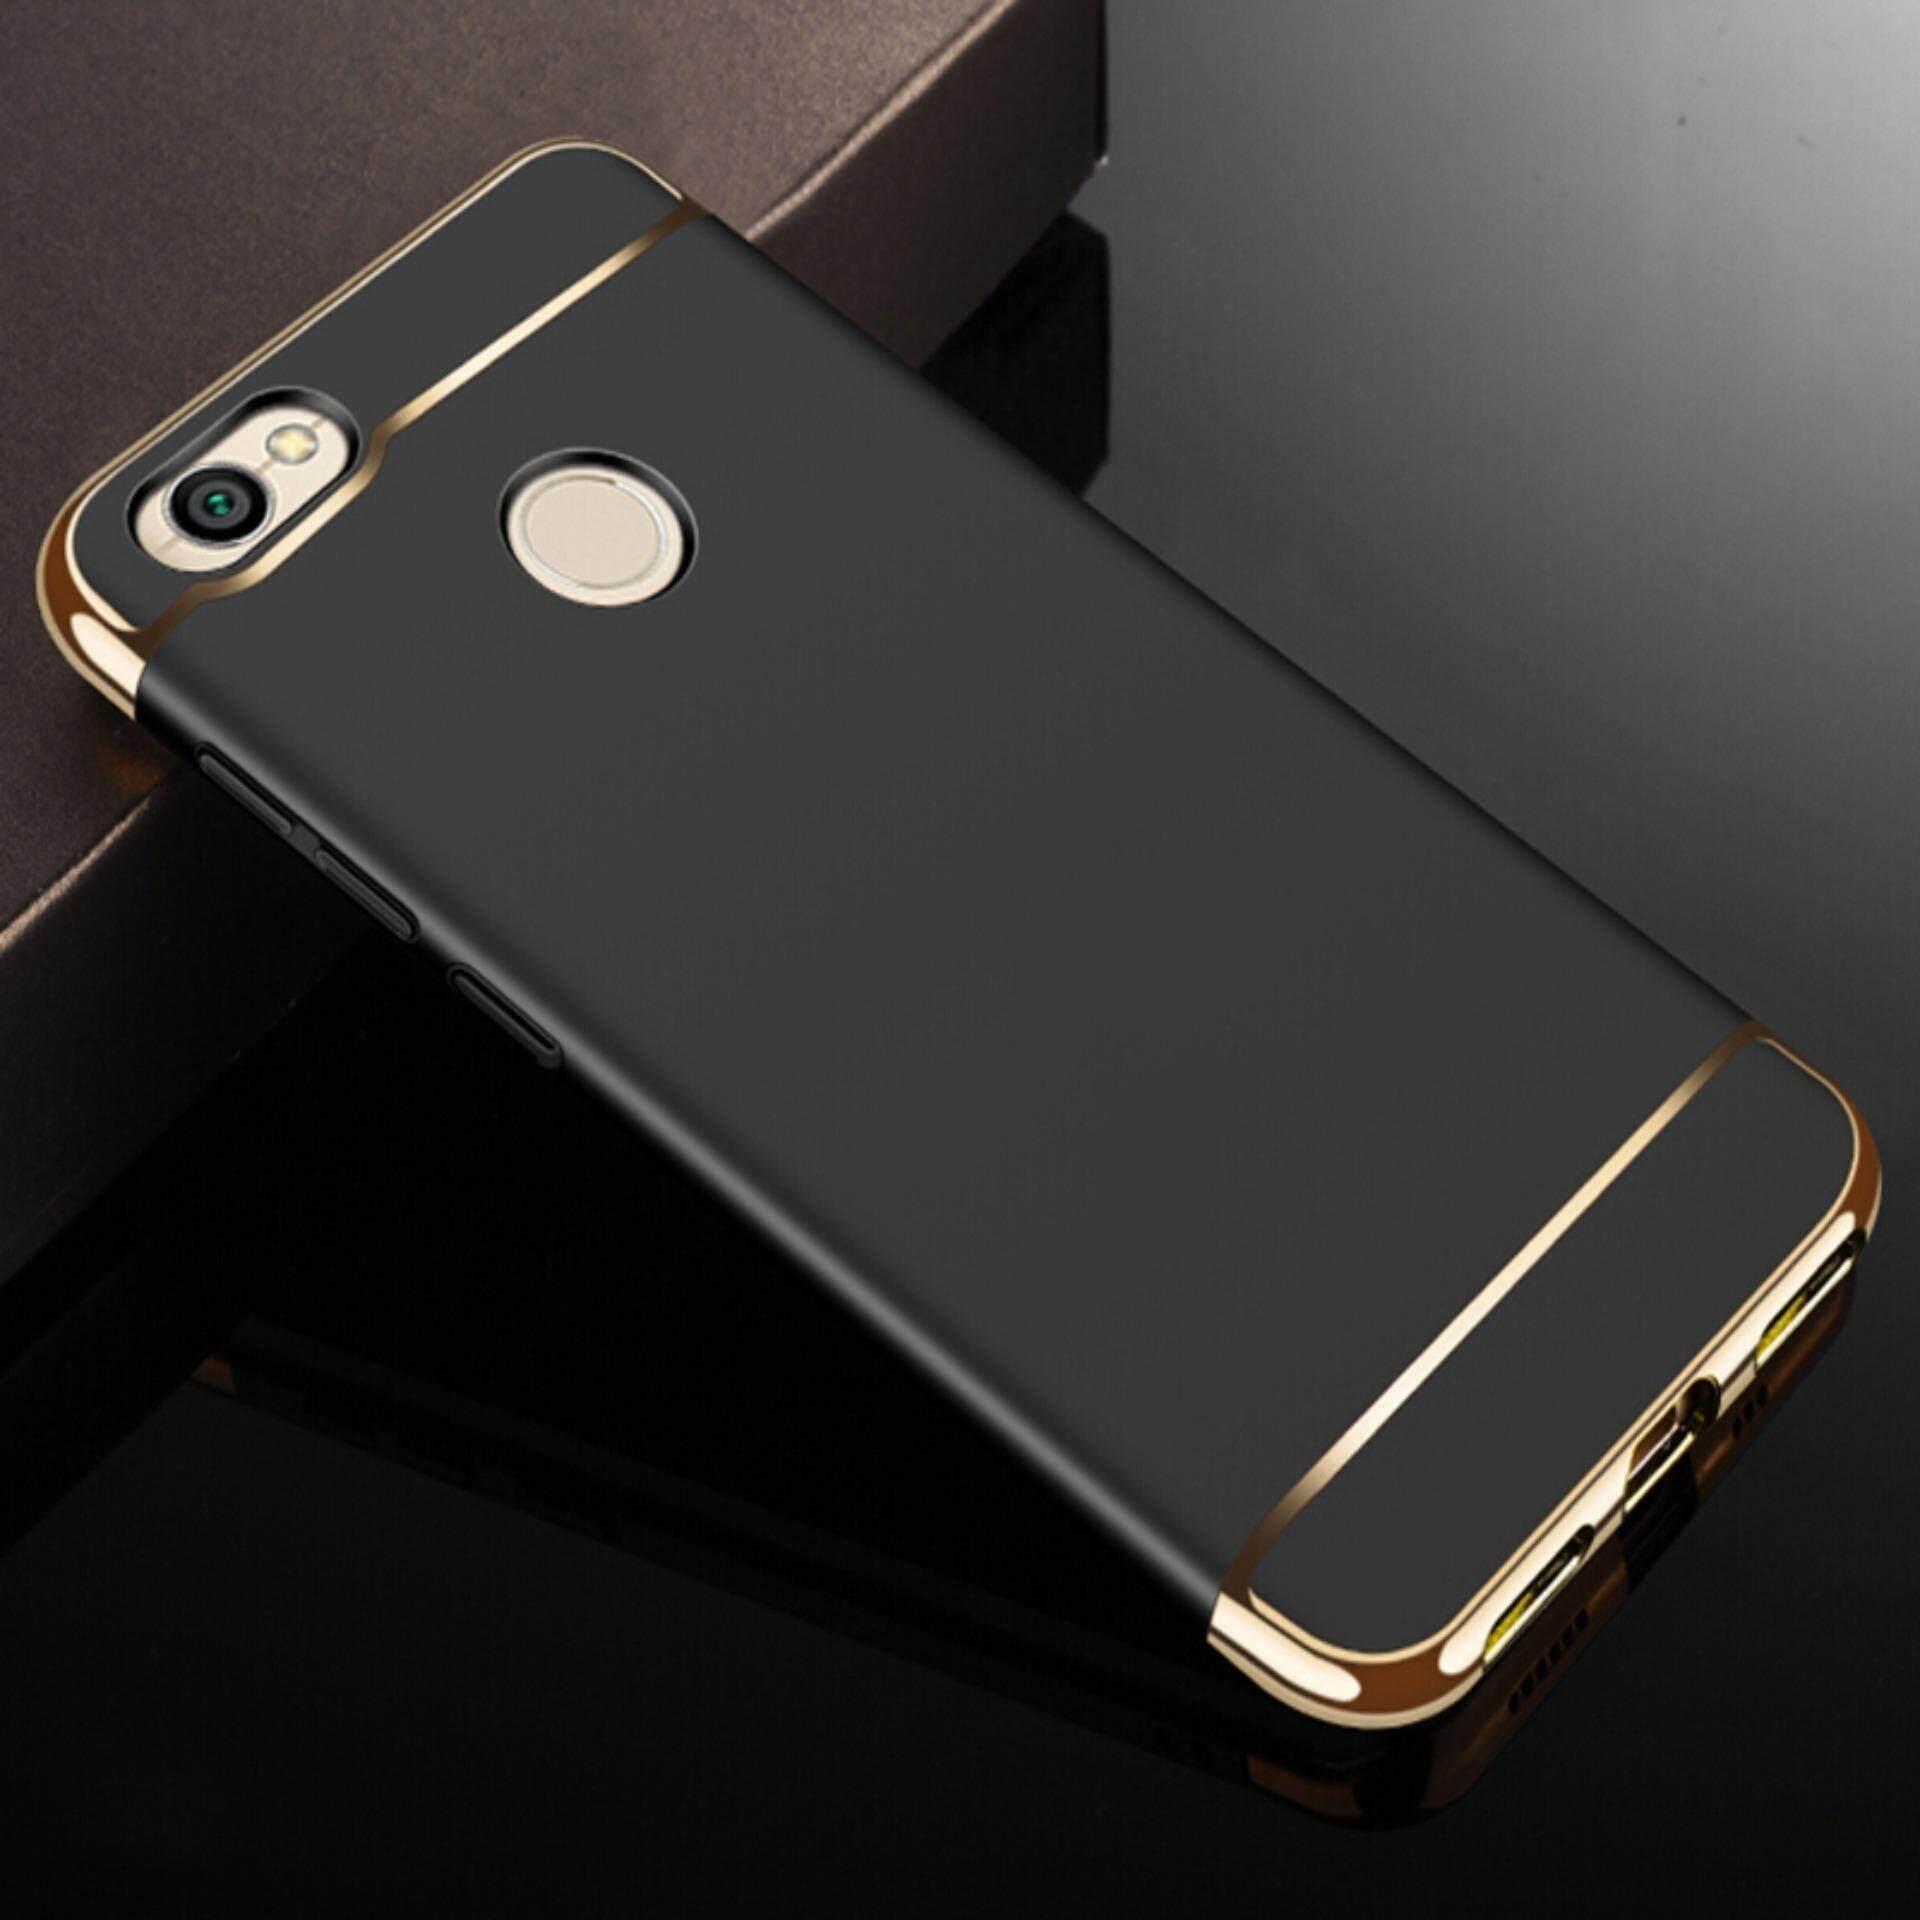 3in1 Ultra Tipis Disadur Buah Belakang Sampul Case untuk Xiaomi Redmi Note 5A Prime/Xiaomi Redmi Y1- internasional